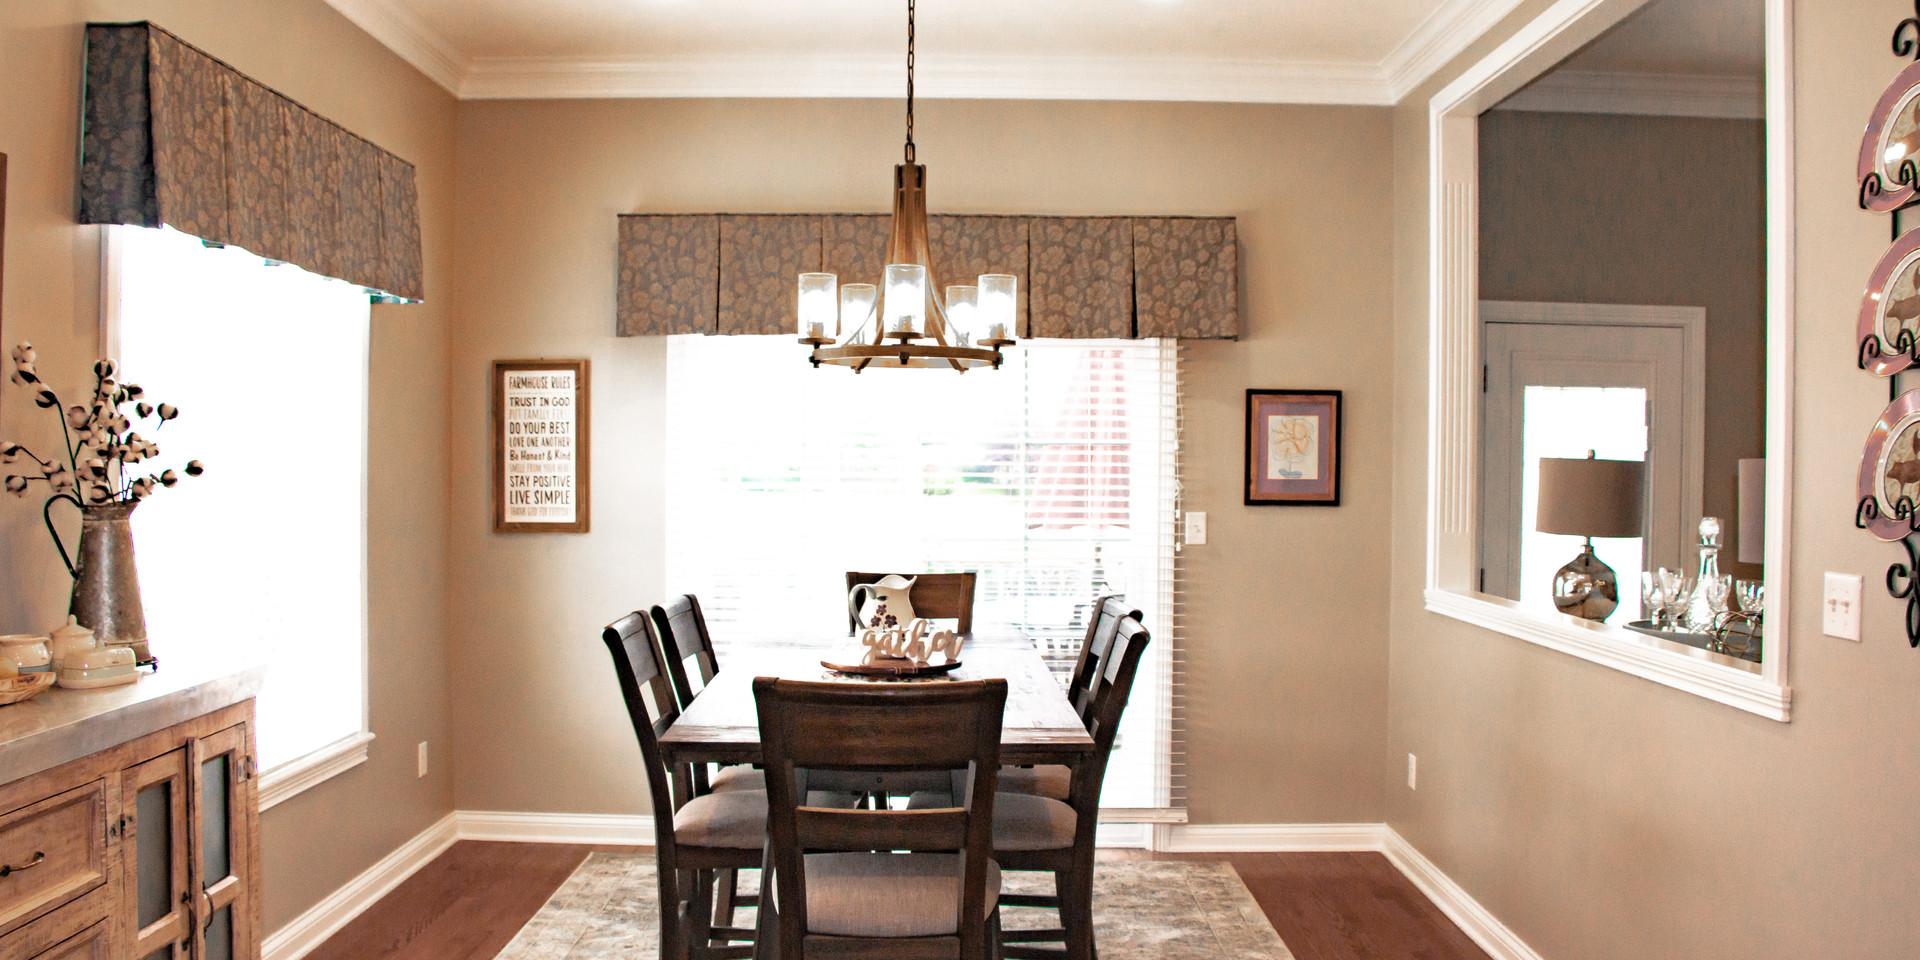 Home_remodel_Kitchen